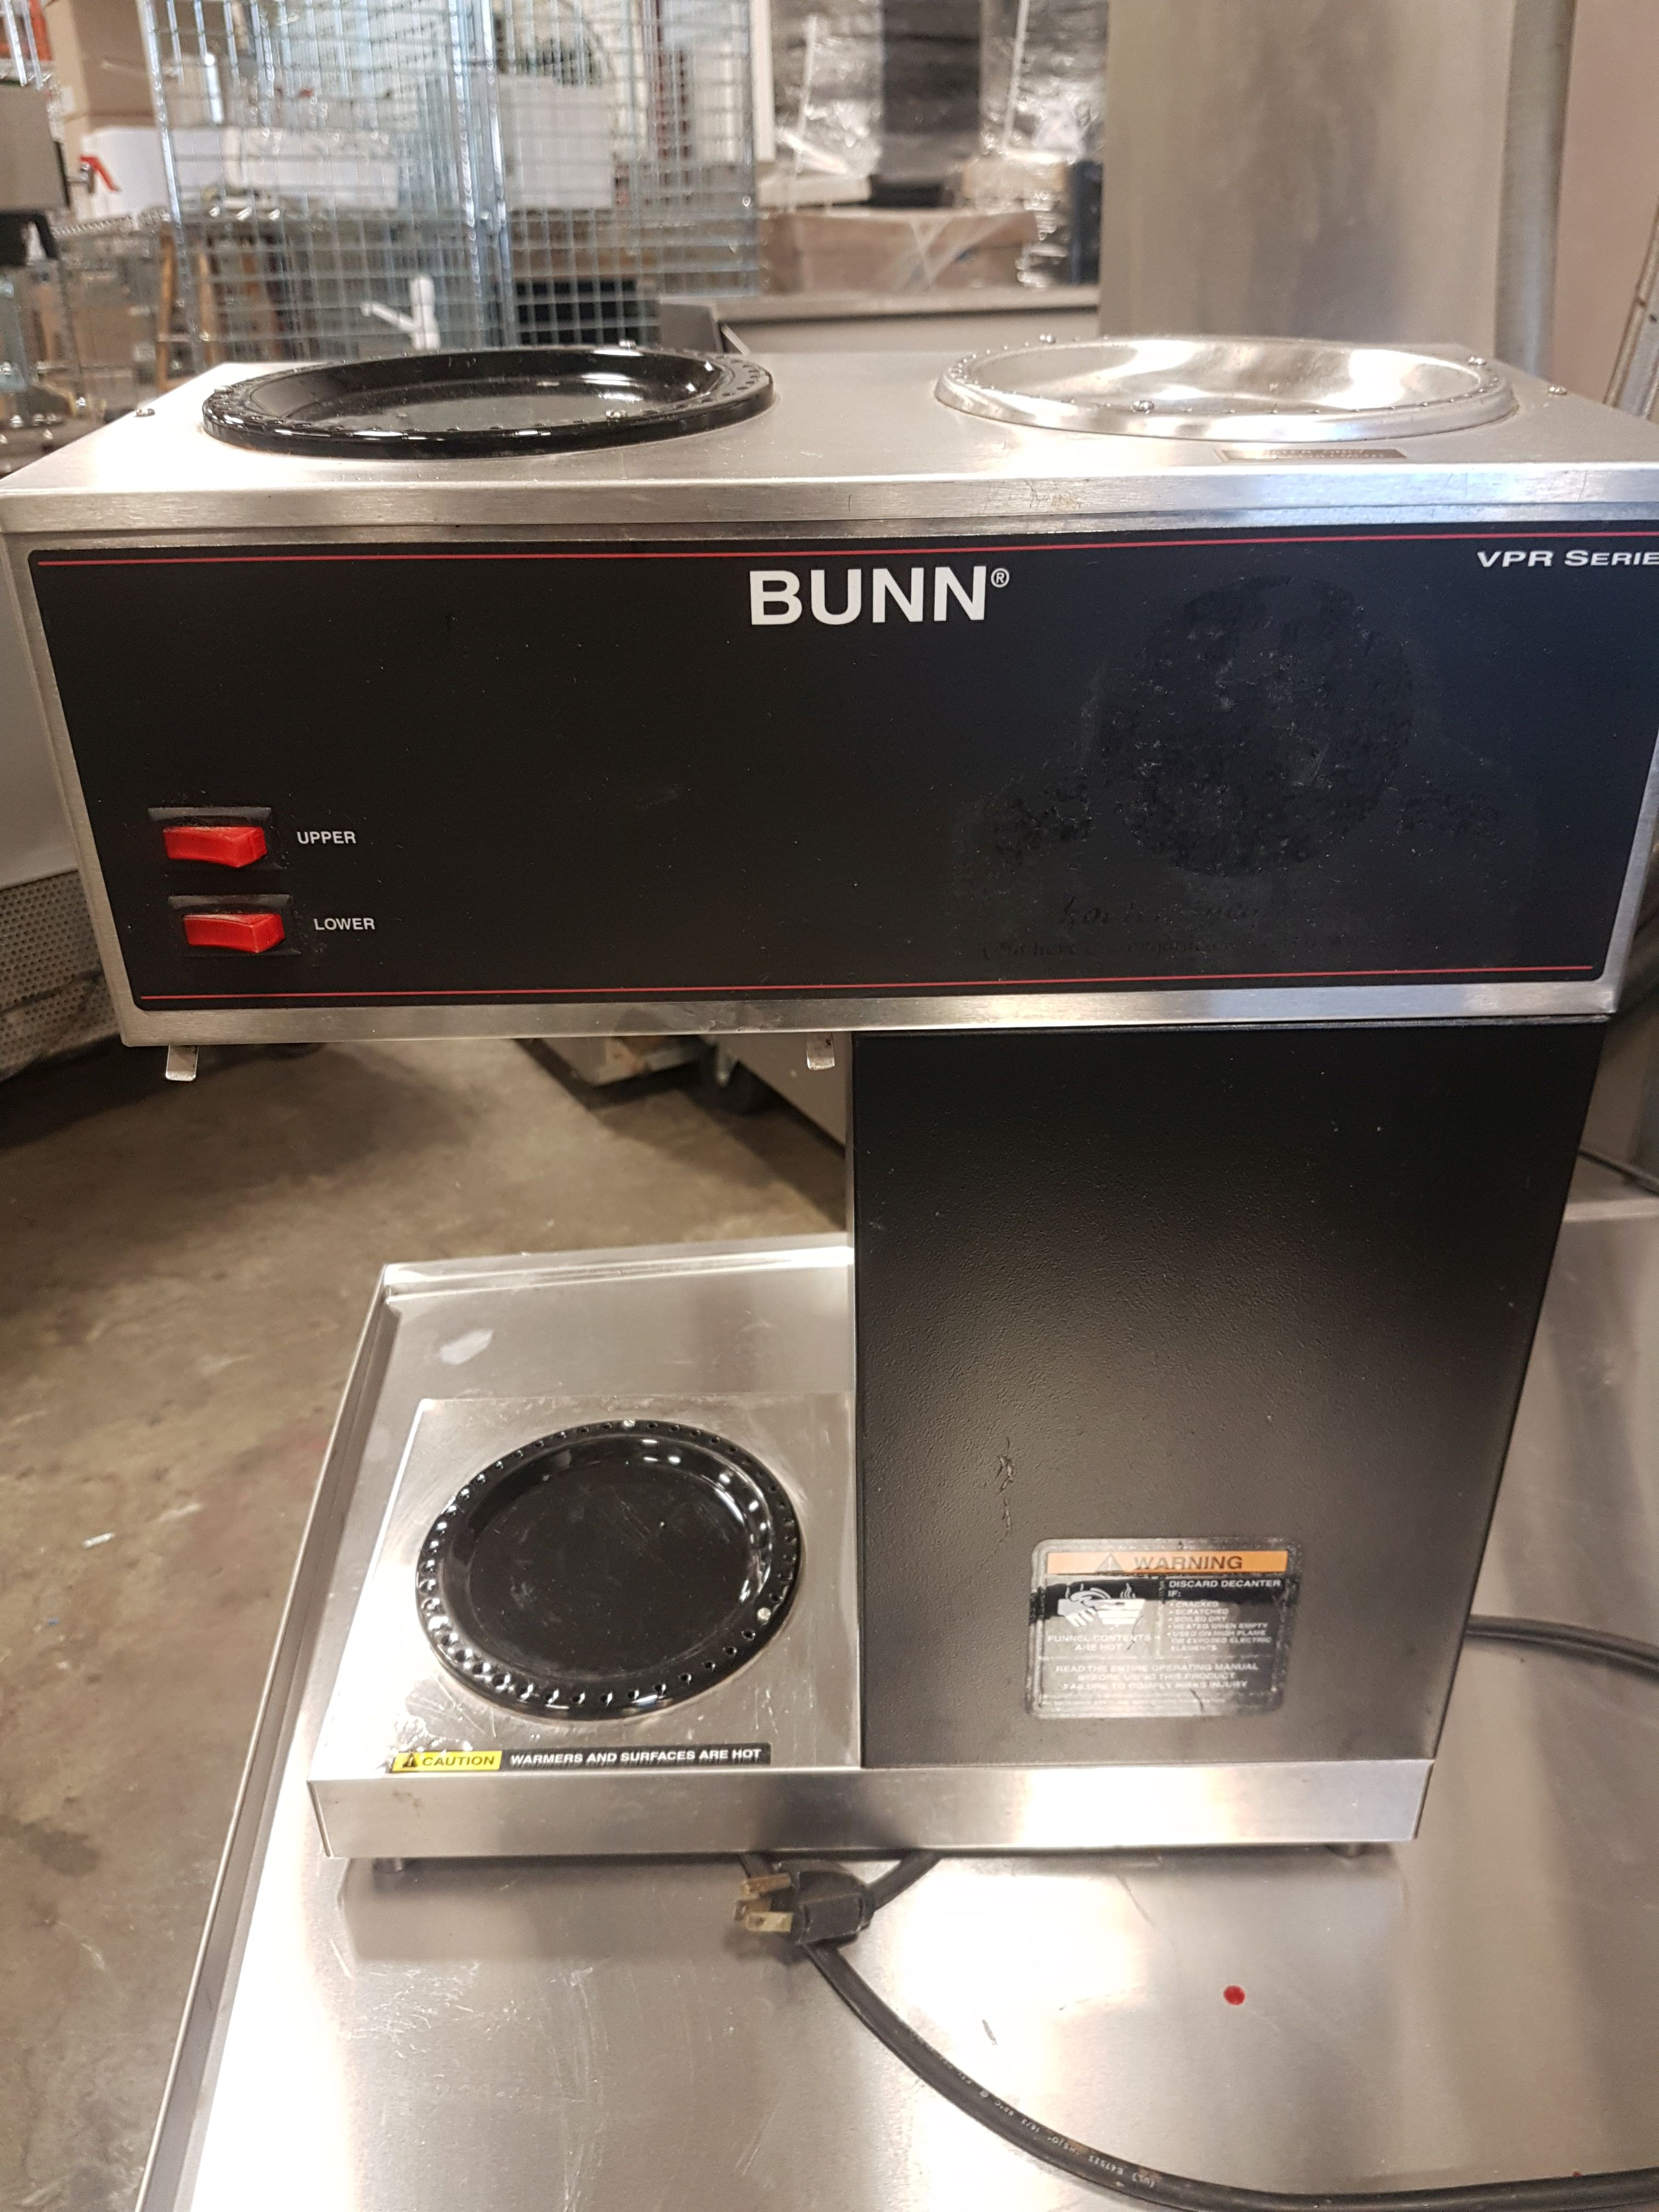 Lot 48 - Bunn VPR Series Coffee Maker